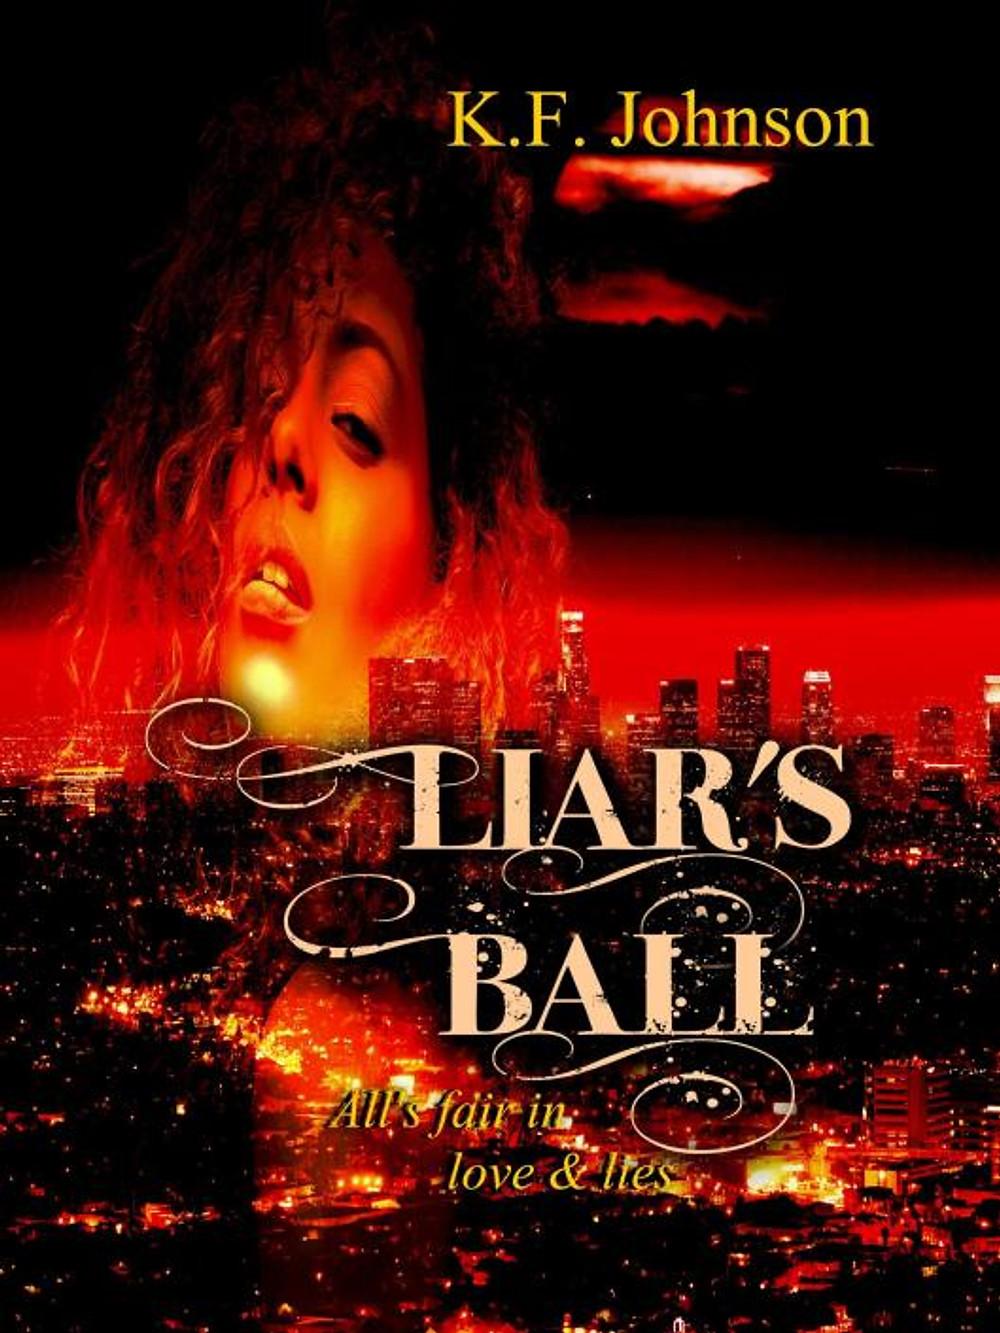 Liar's Ball-72dpi-1500x2000 (1)ebookcover